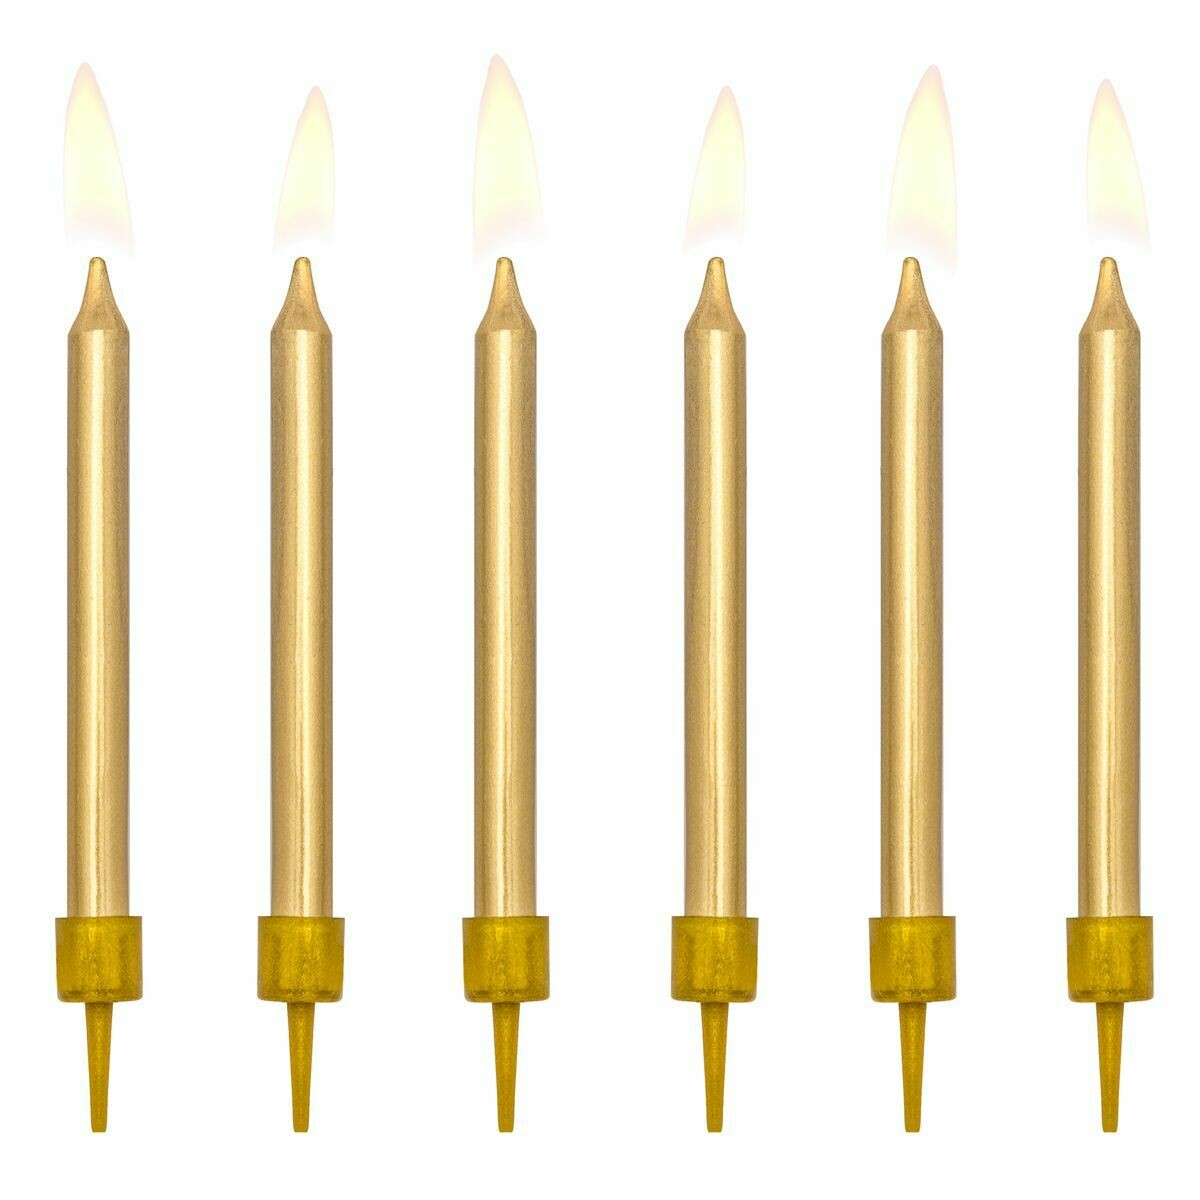 PartyDeco Birthday Candles -6εκ PLAIN GOLD 6 τεμ - Χρυσά Κεράκια 6εκ